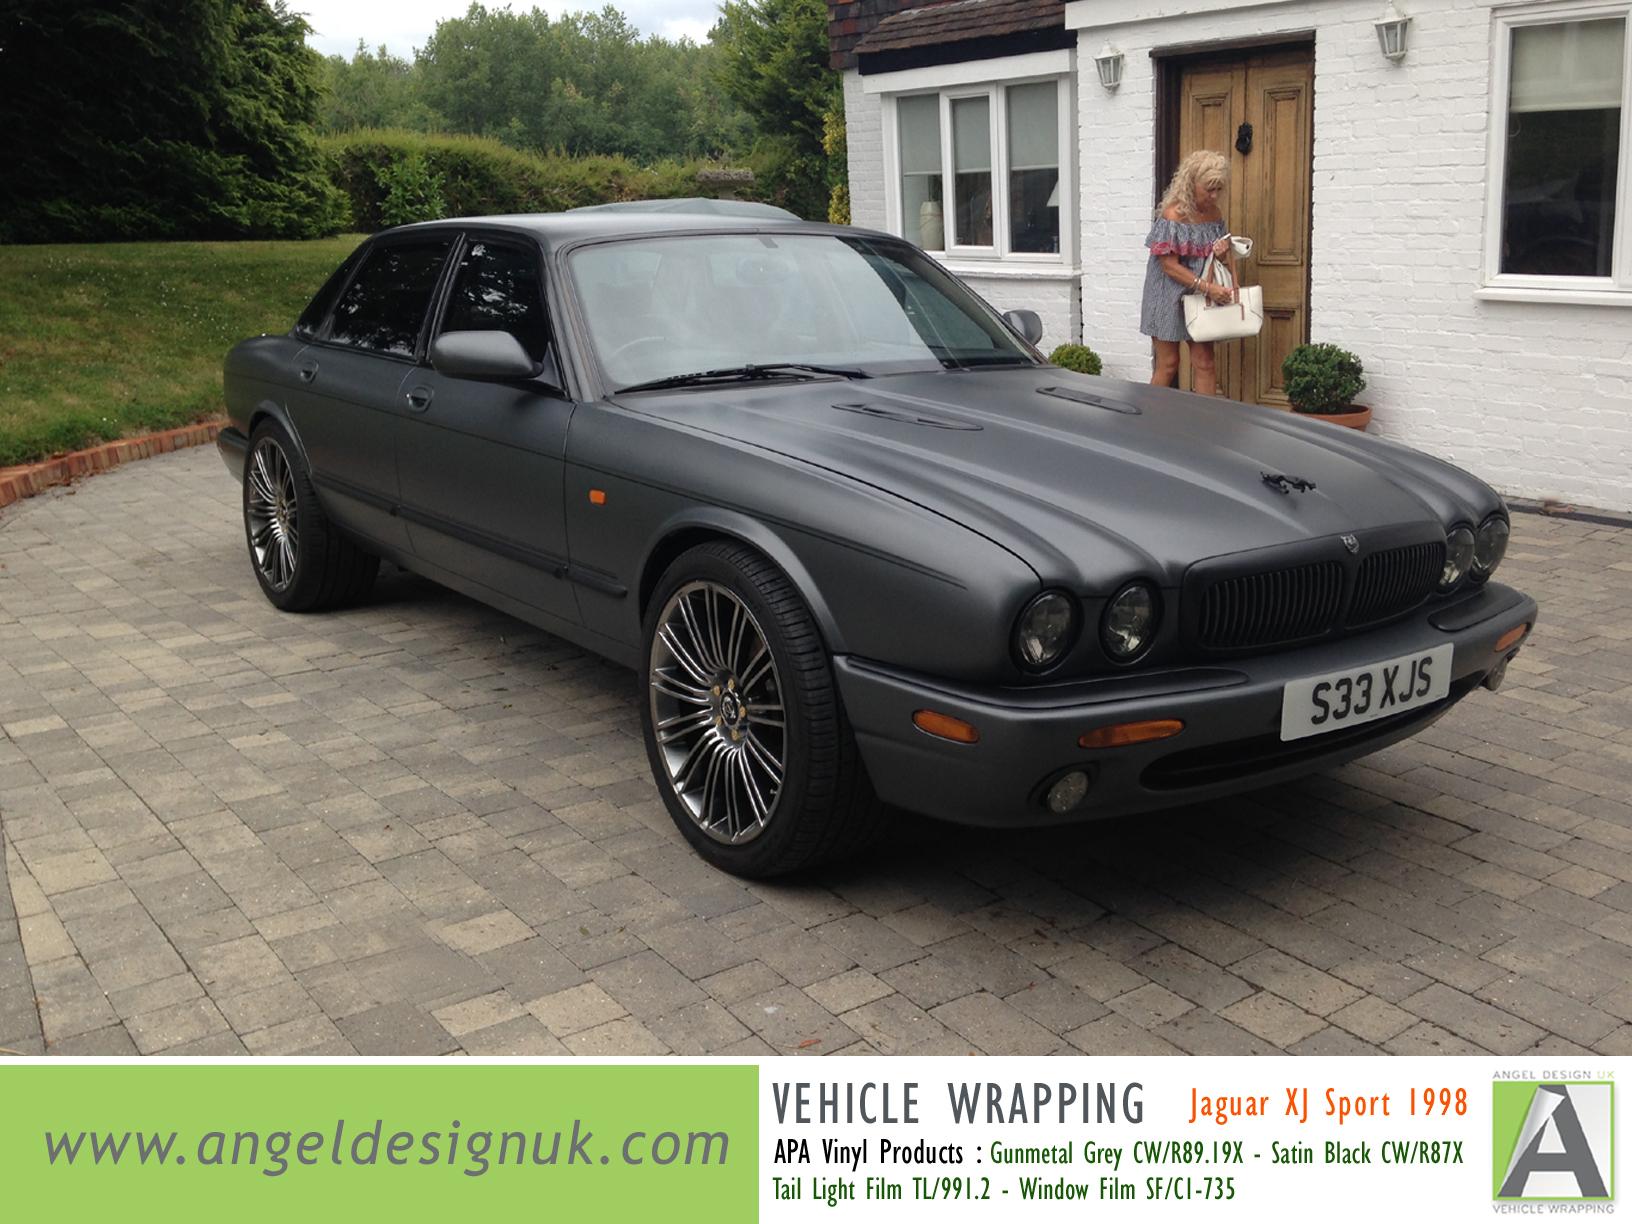 ANGEL DESIGN UK Vehicle Wrapping Jaguar XJ Sport 1998 Gunmetal Grey Pic 1